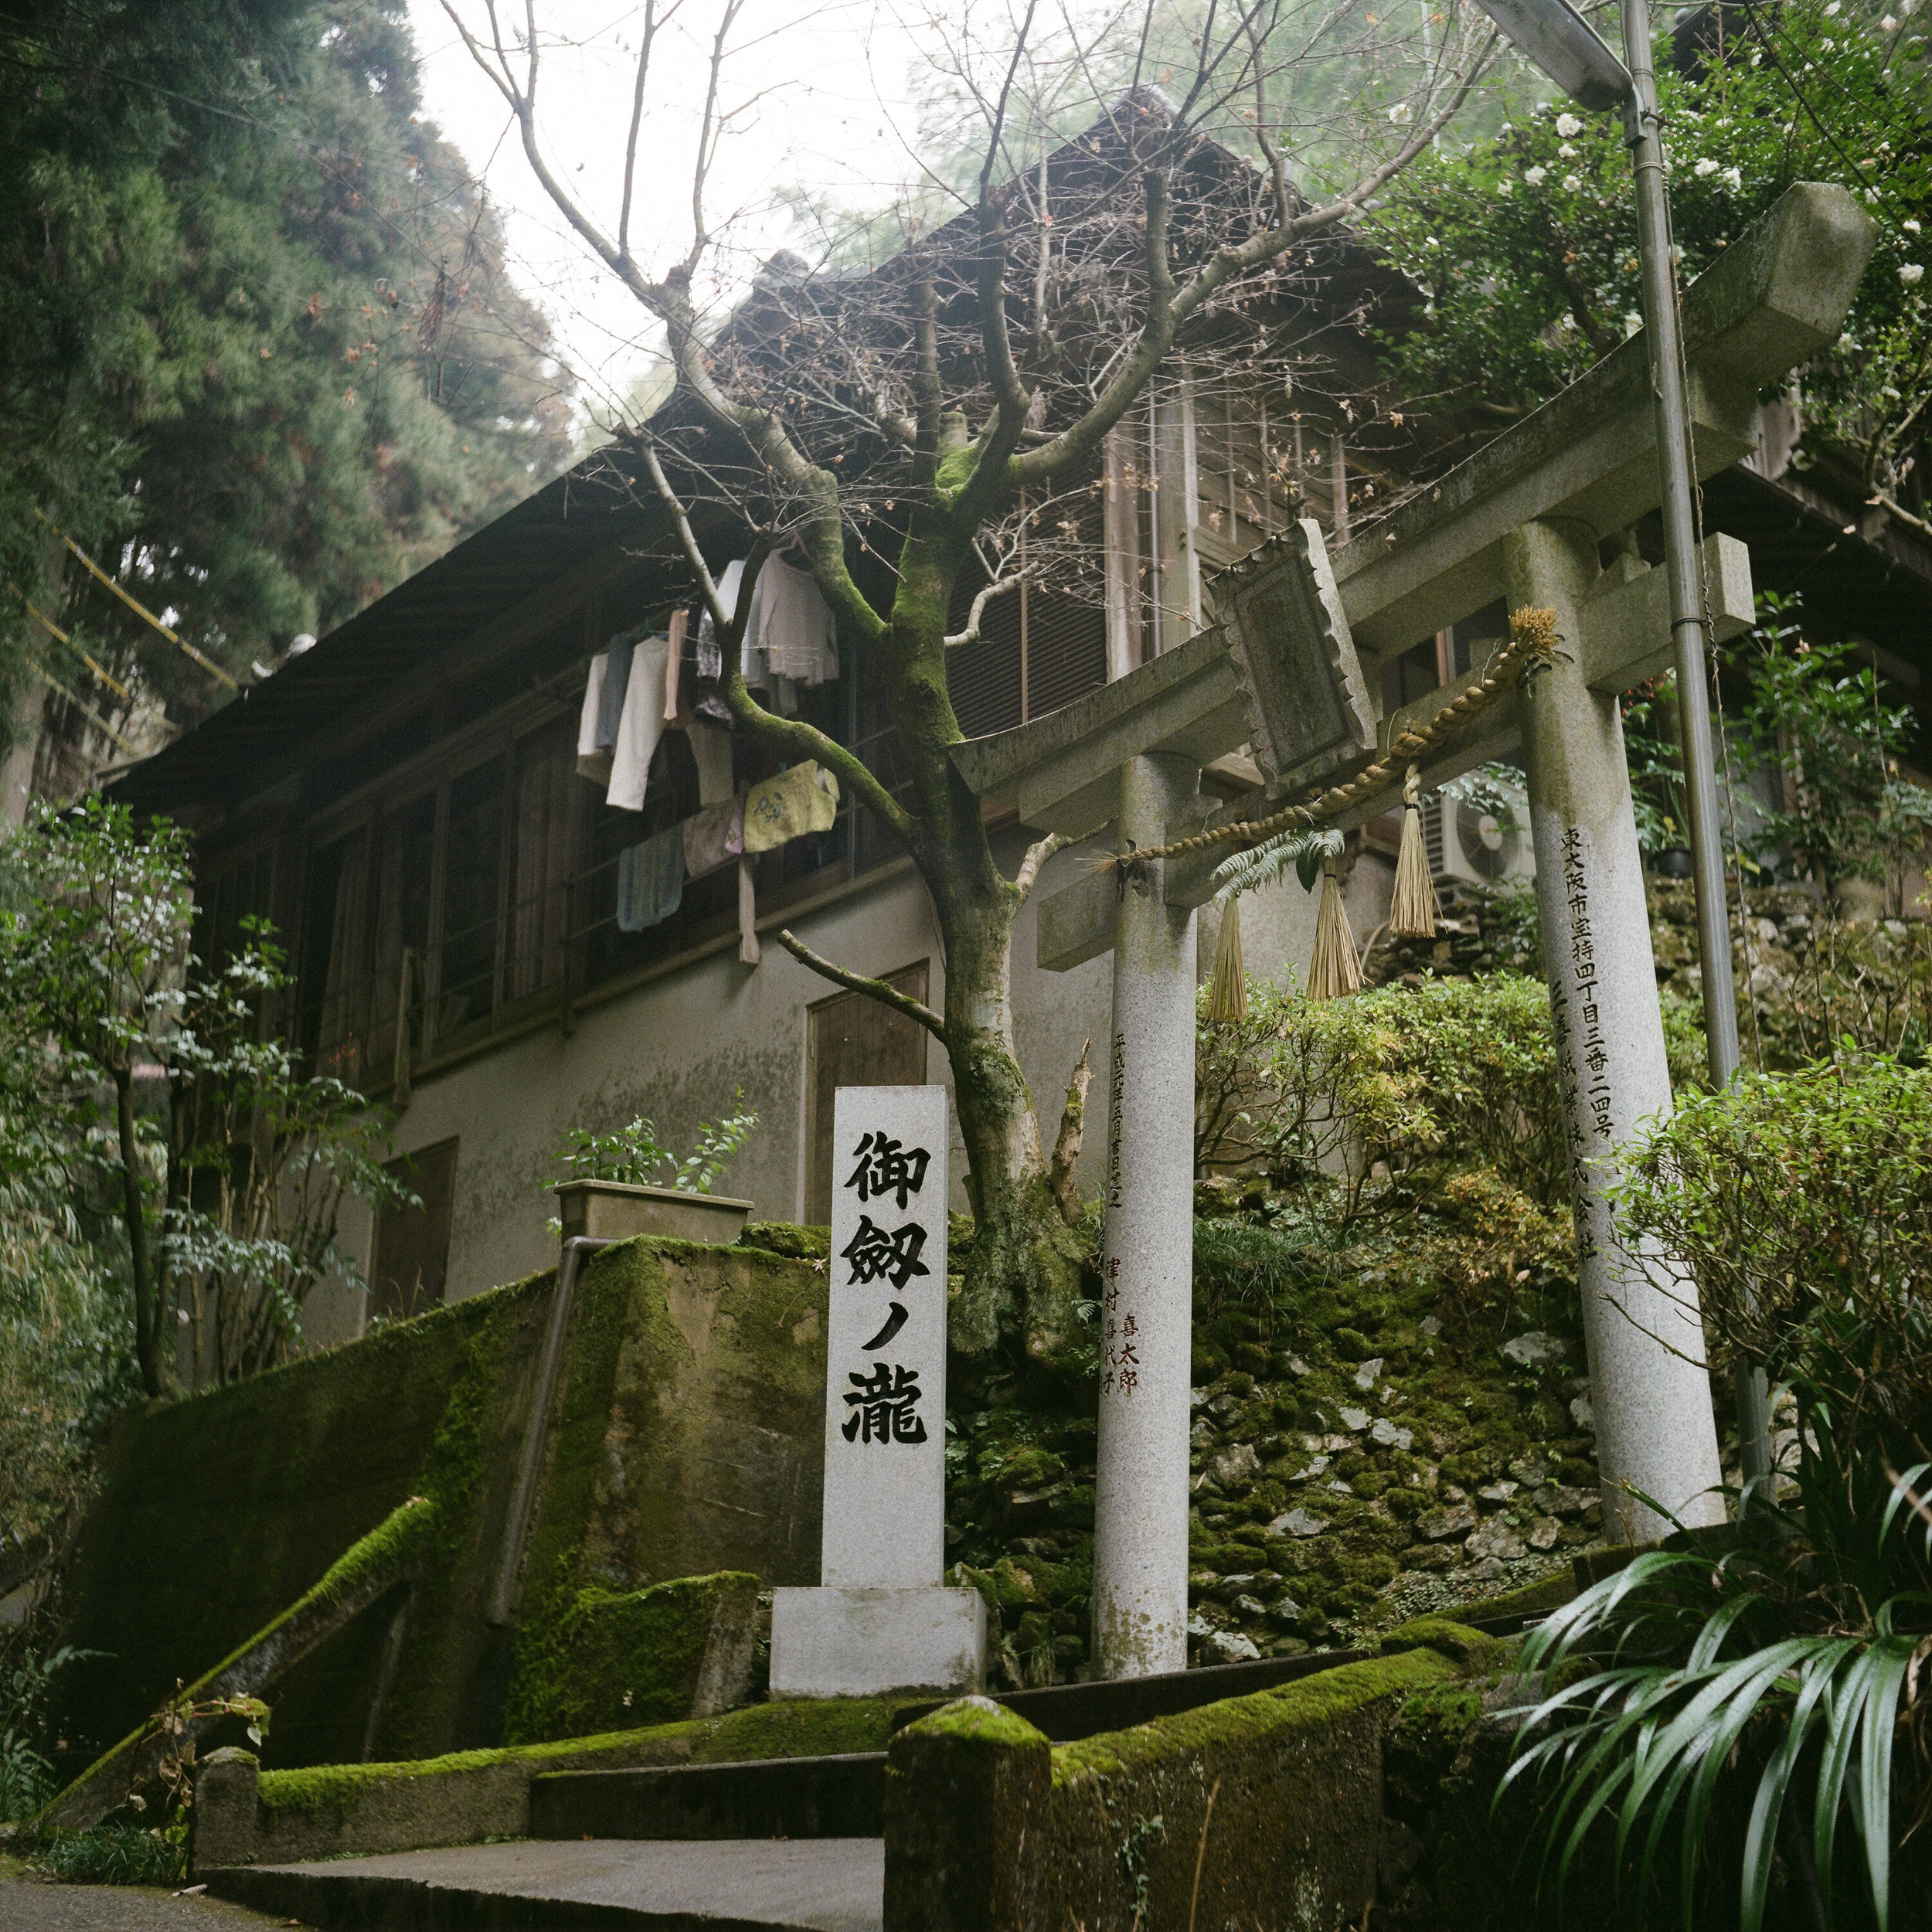 Kyoto, Japan 2018